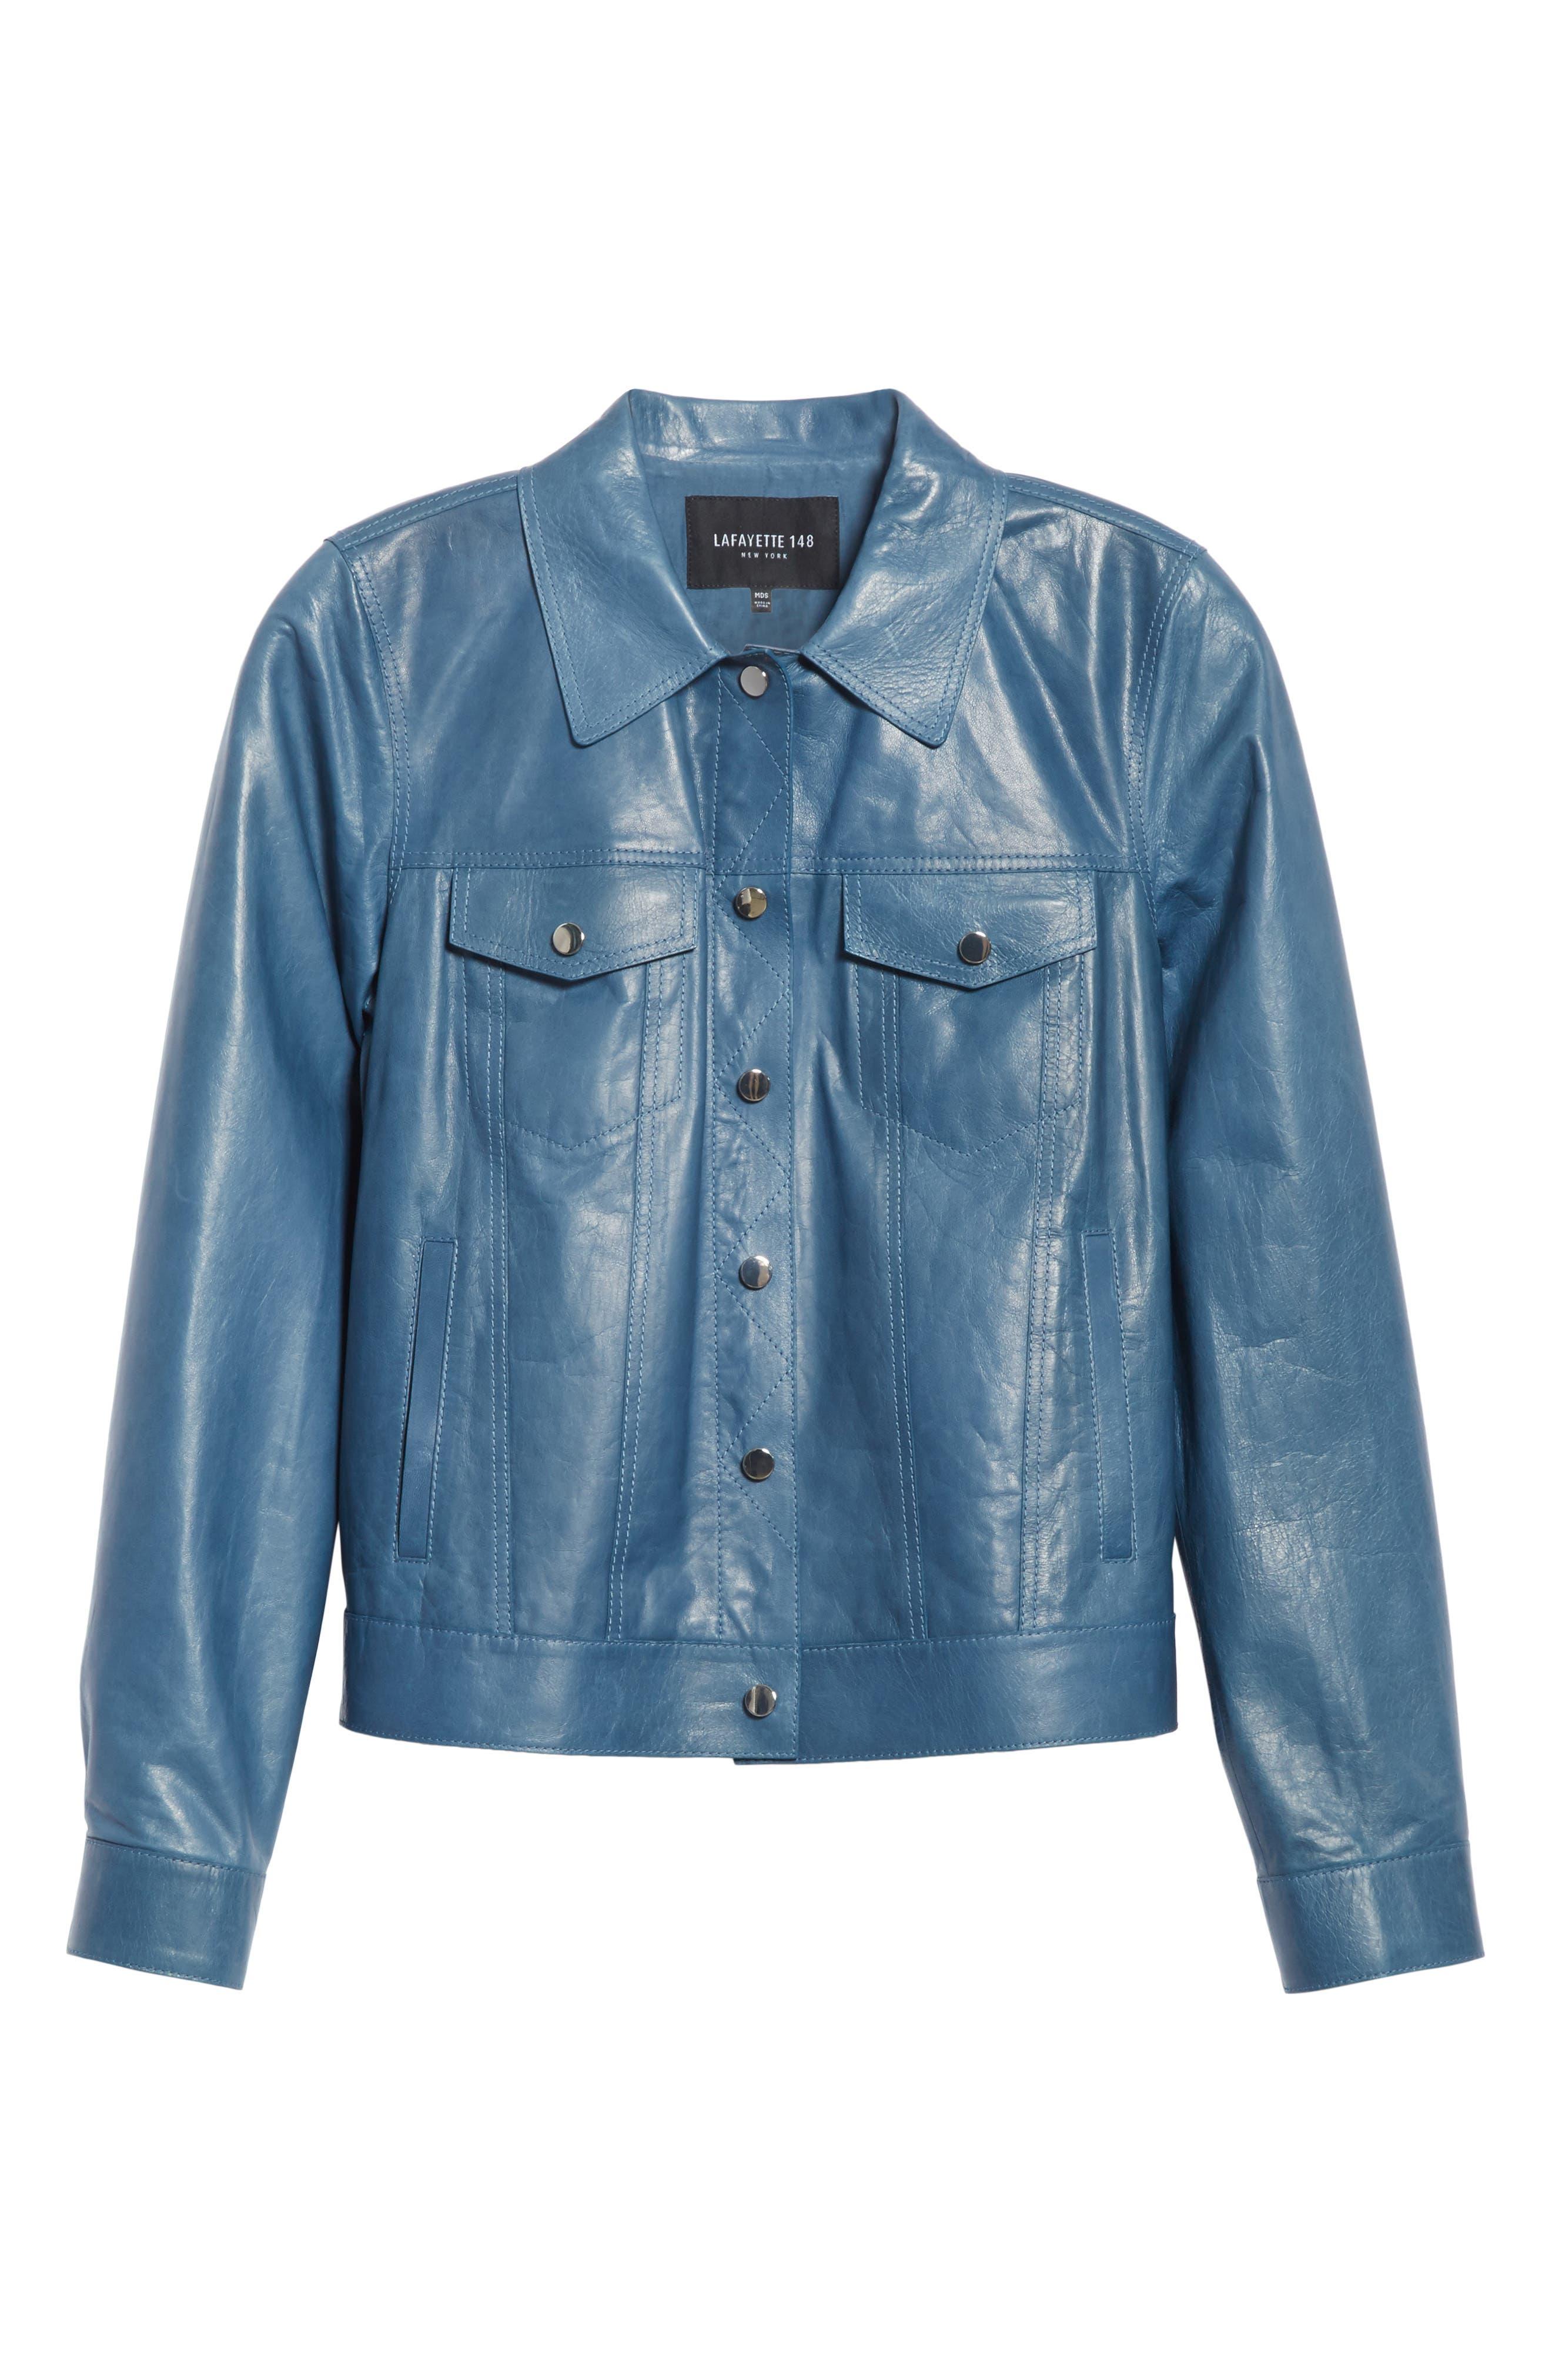 Destiny Leather Jacket,                             Alternate thumbnail 7, color,                             Placid Blue